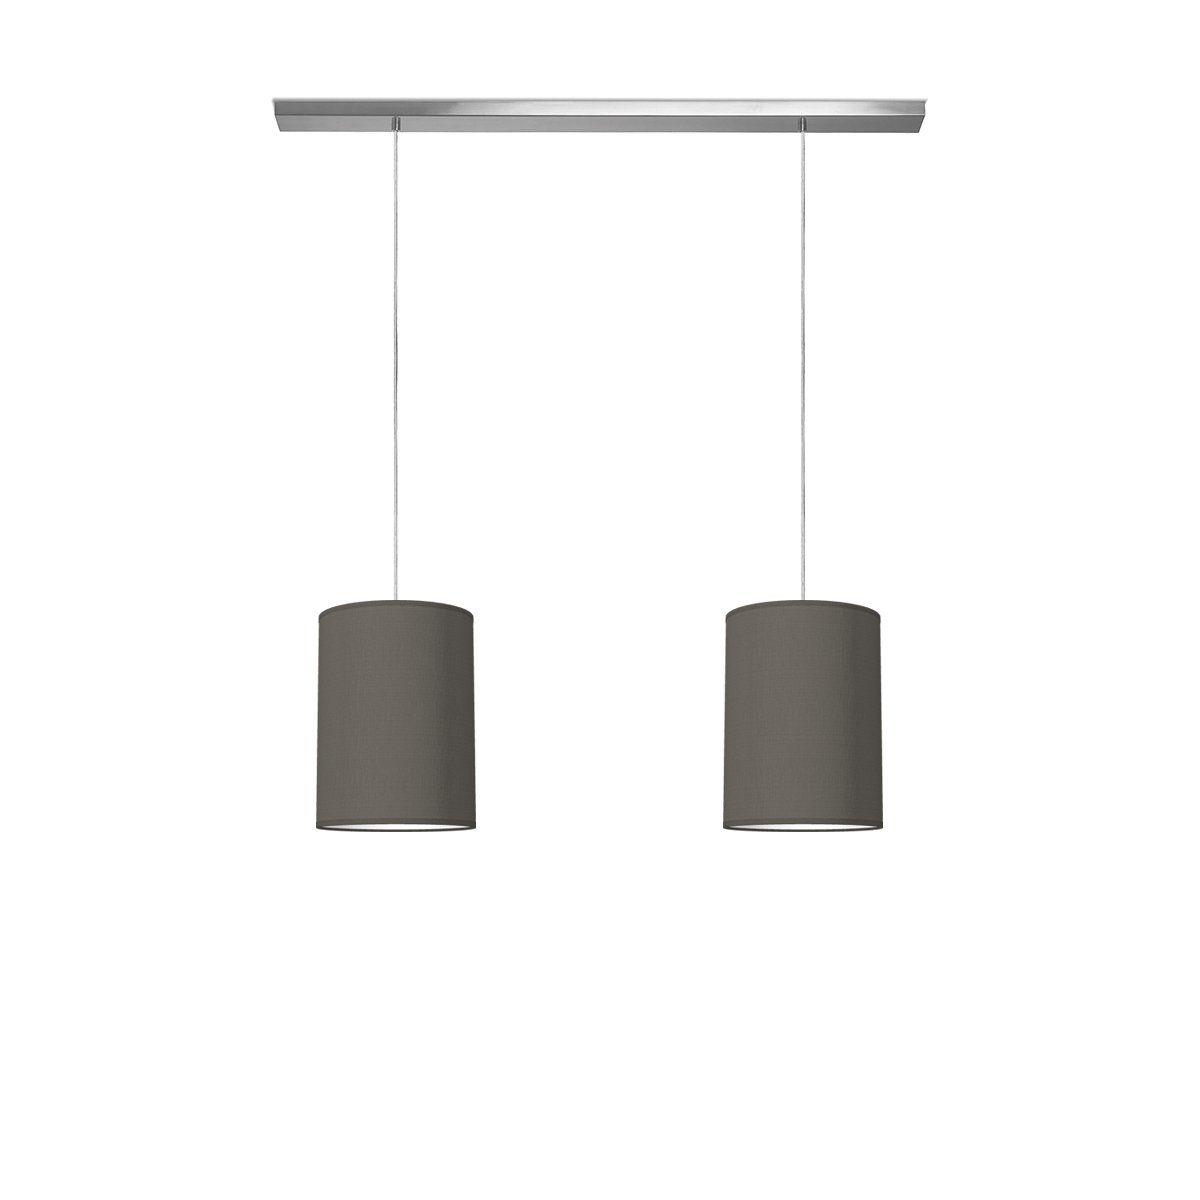 hanglamp beam 2 tube Ø 25 cm - antraciet